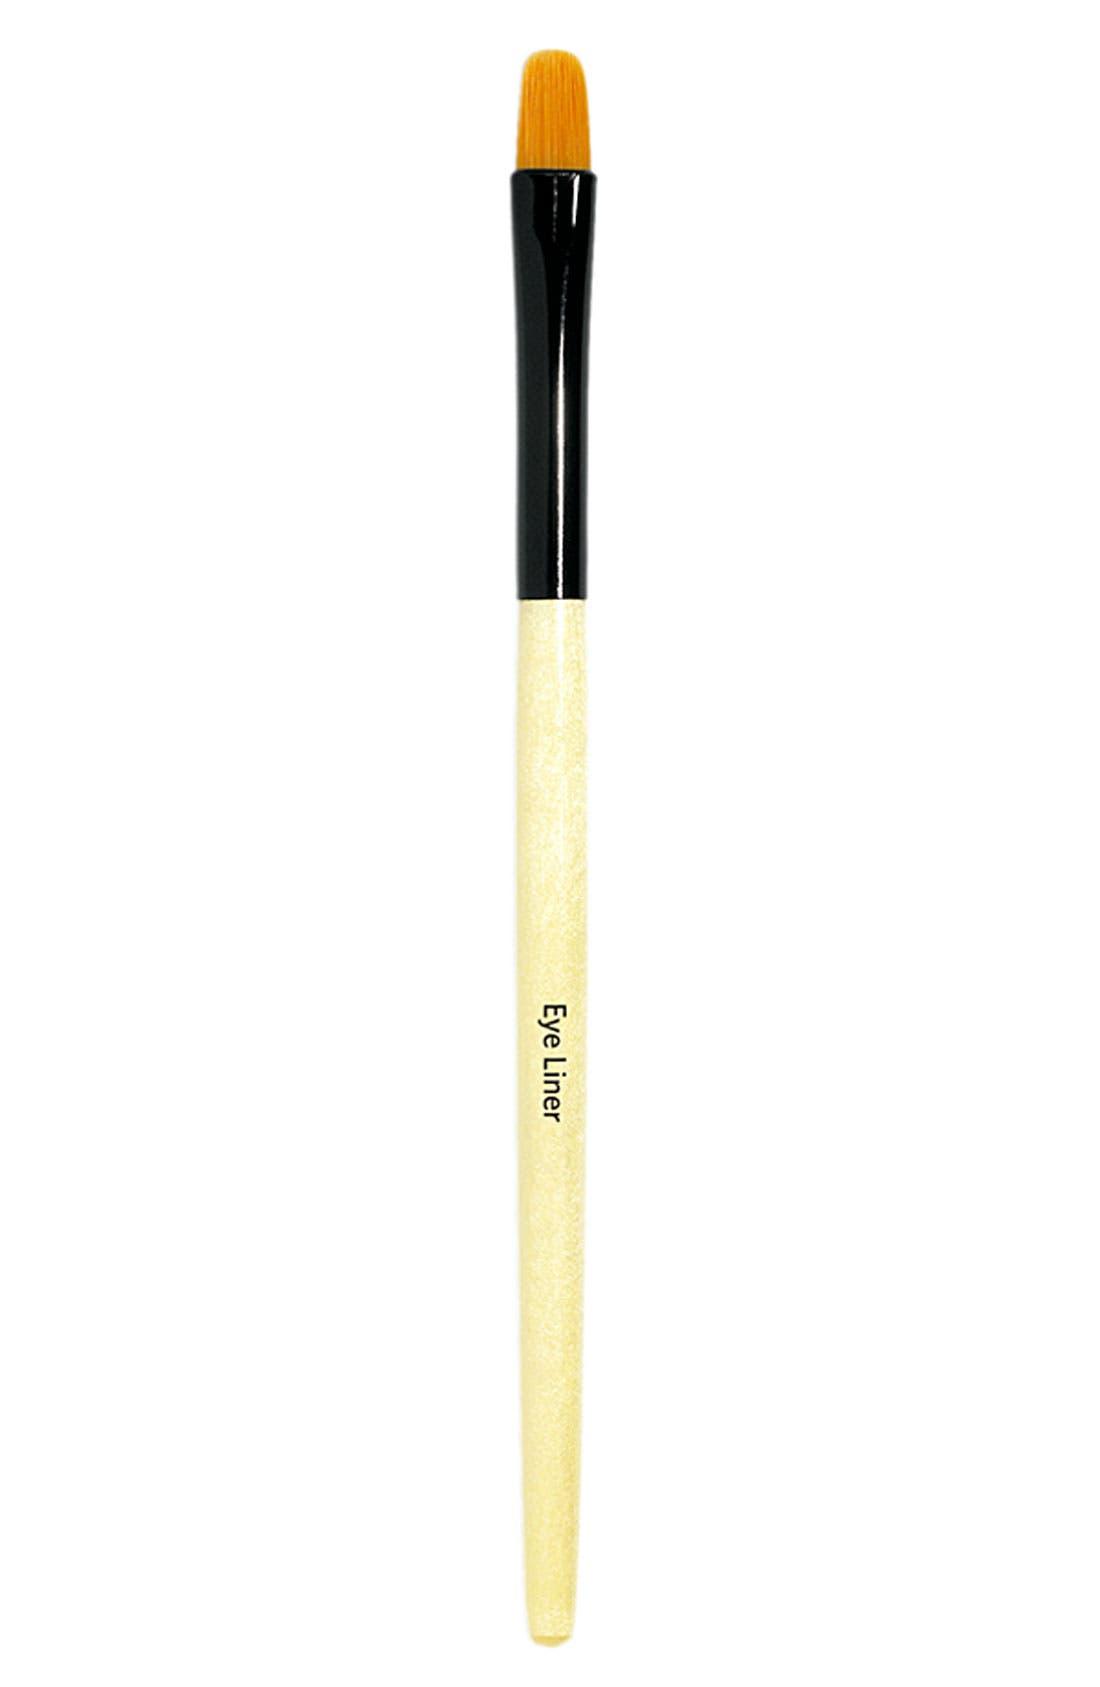 Eyeliner Brush,                         Main,                         color, NO COLOR